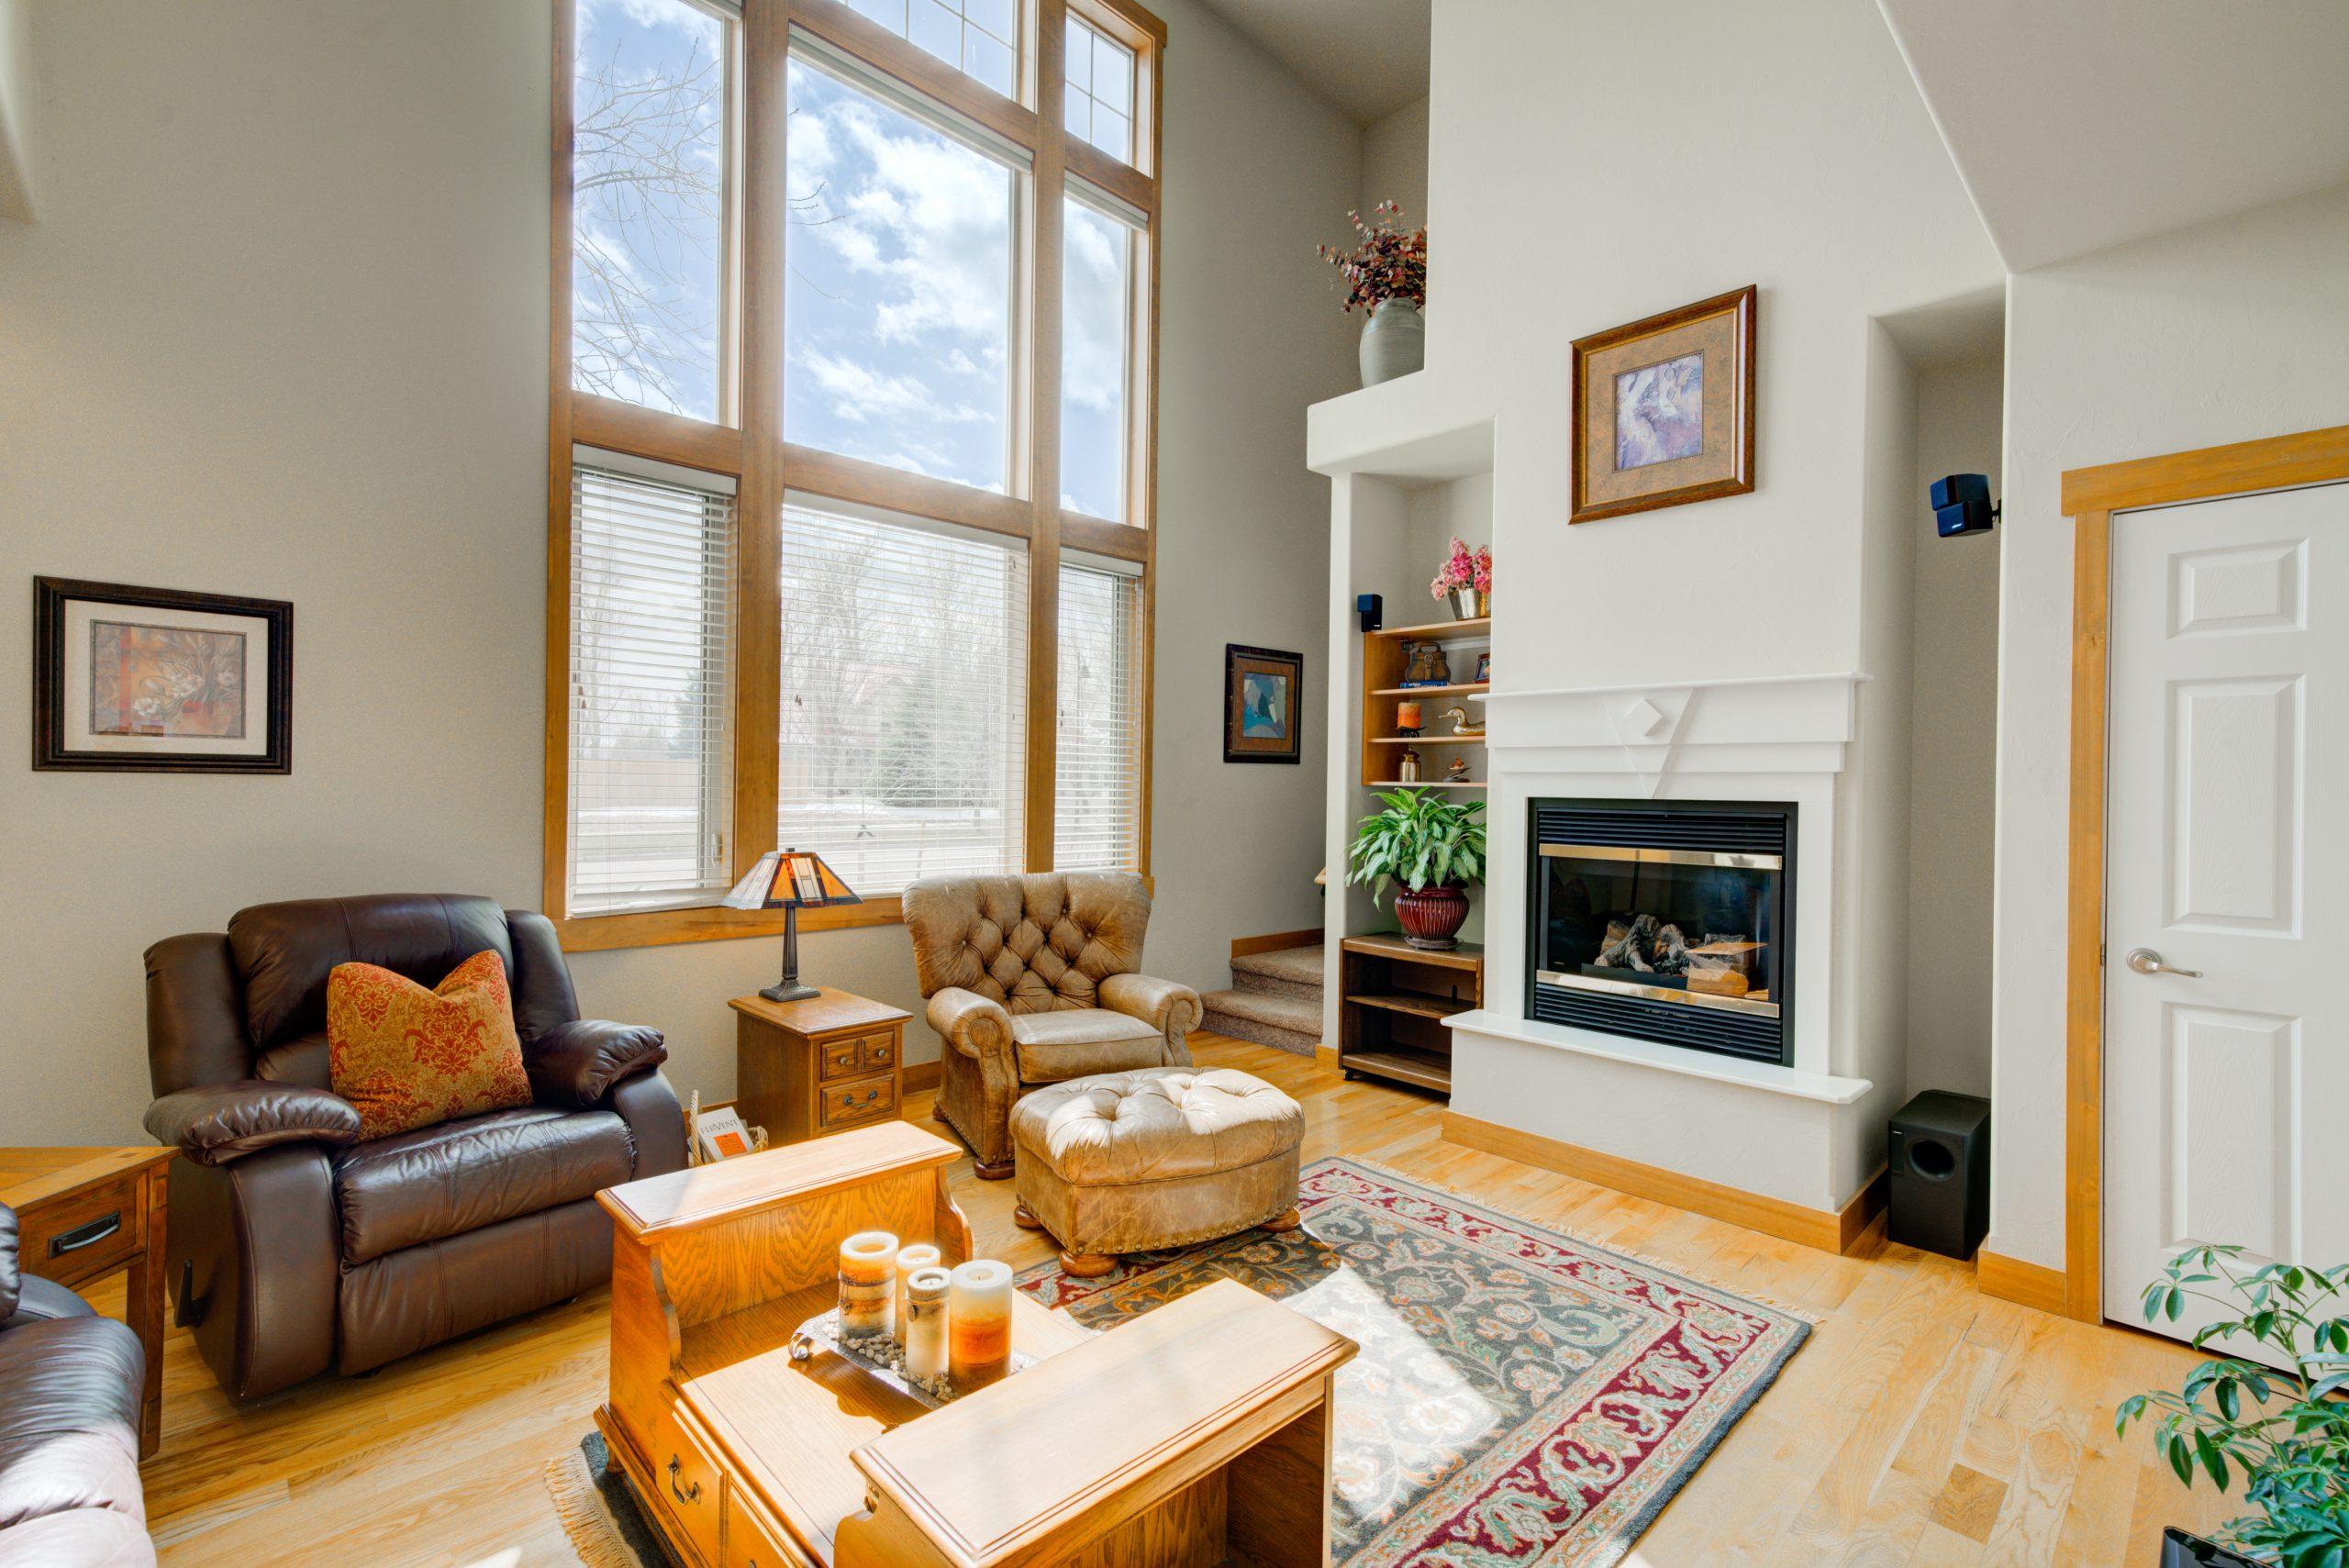 3 Bedroom Gallatin Green Condo For Sale in Baxter Meadows